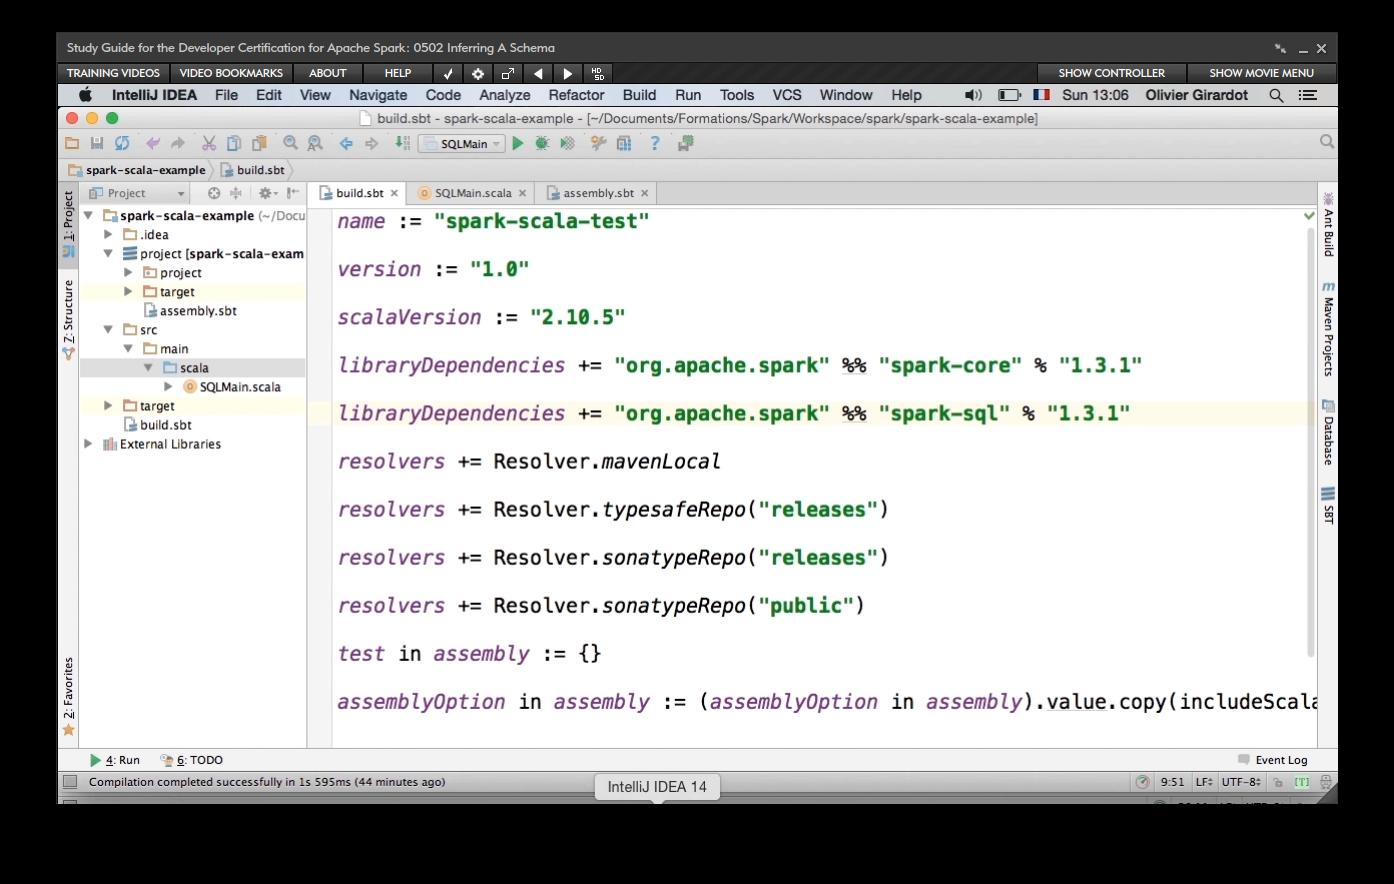 Amazon com: Study Guide for the Developer Certification for Apache